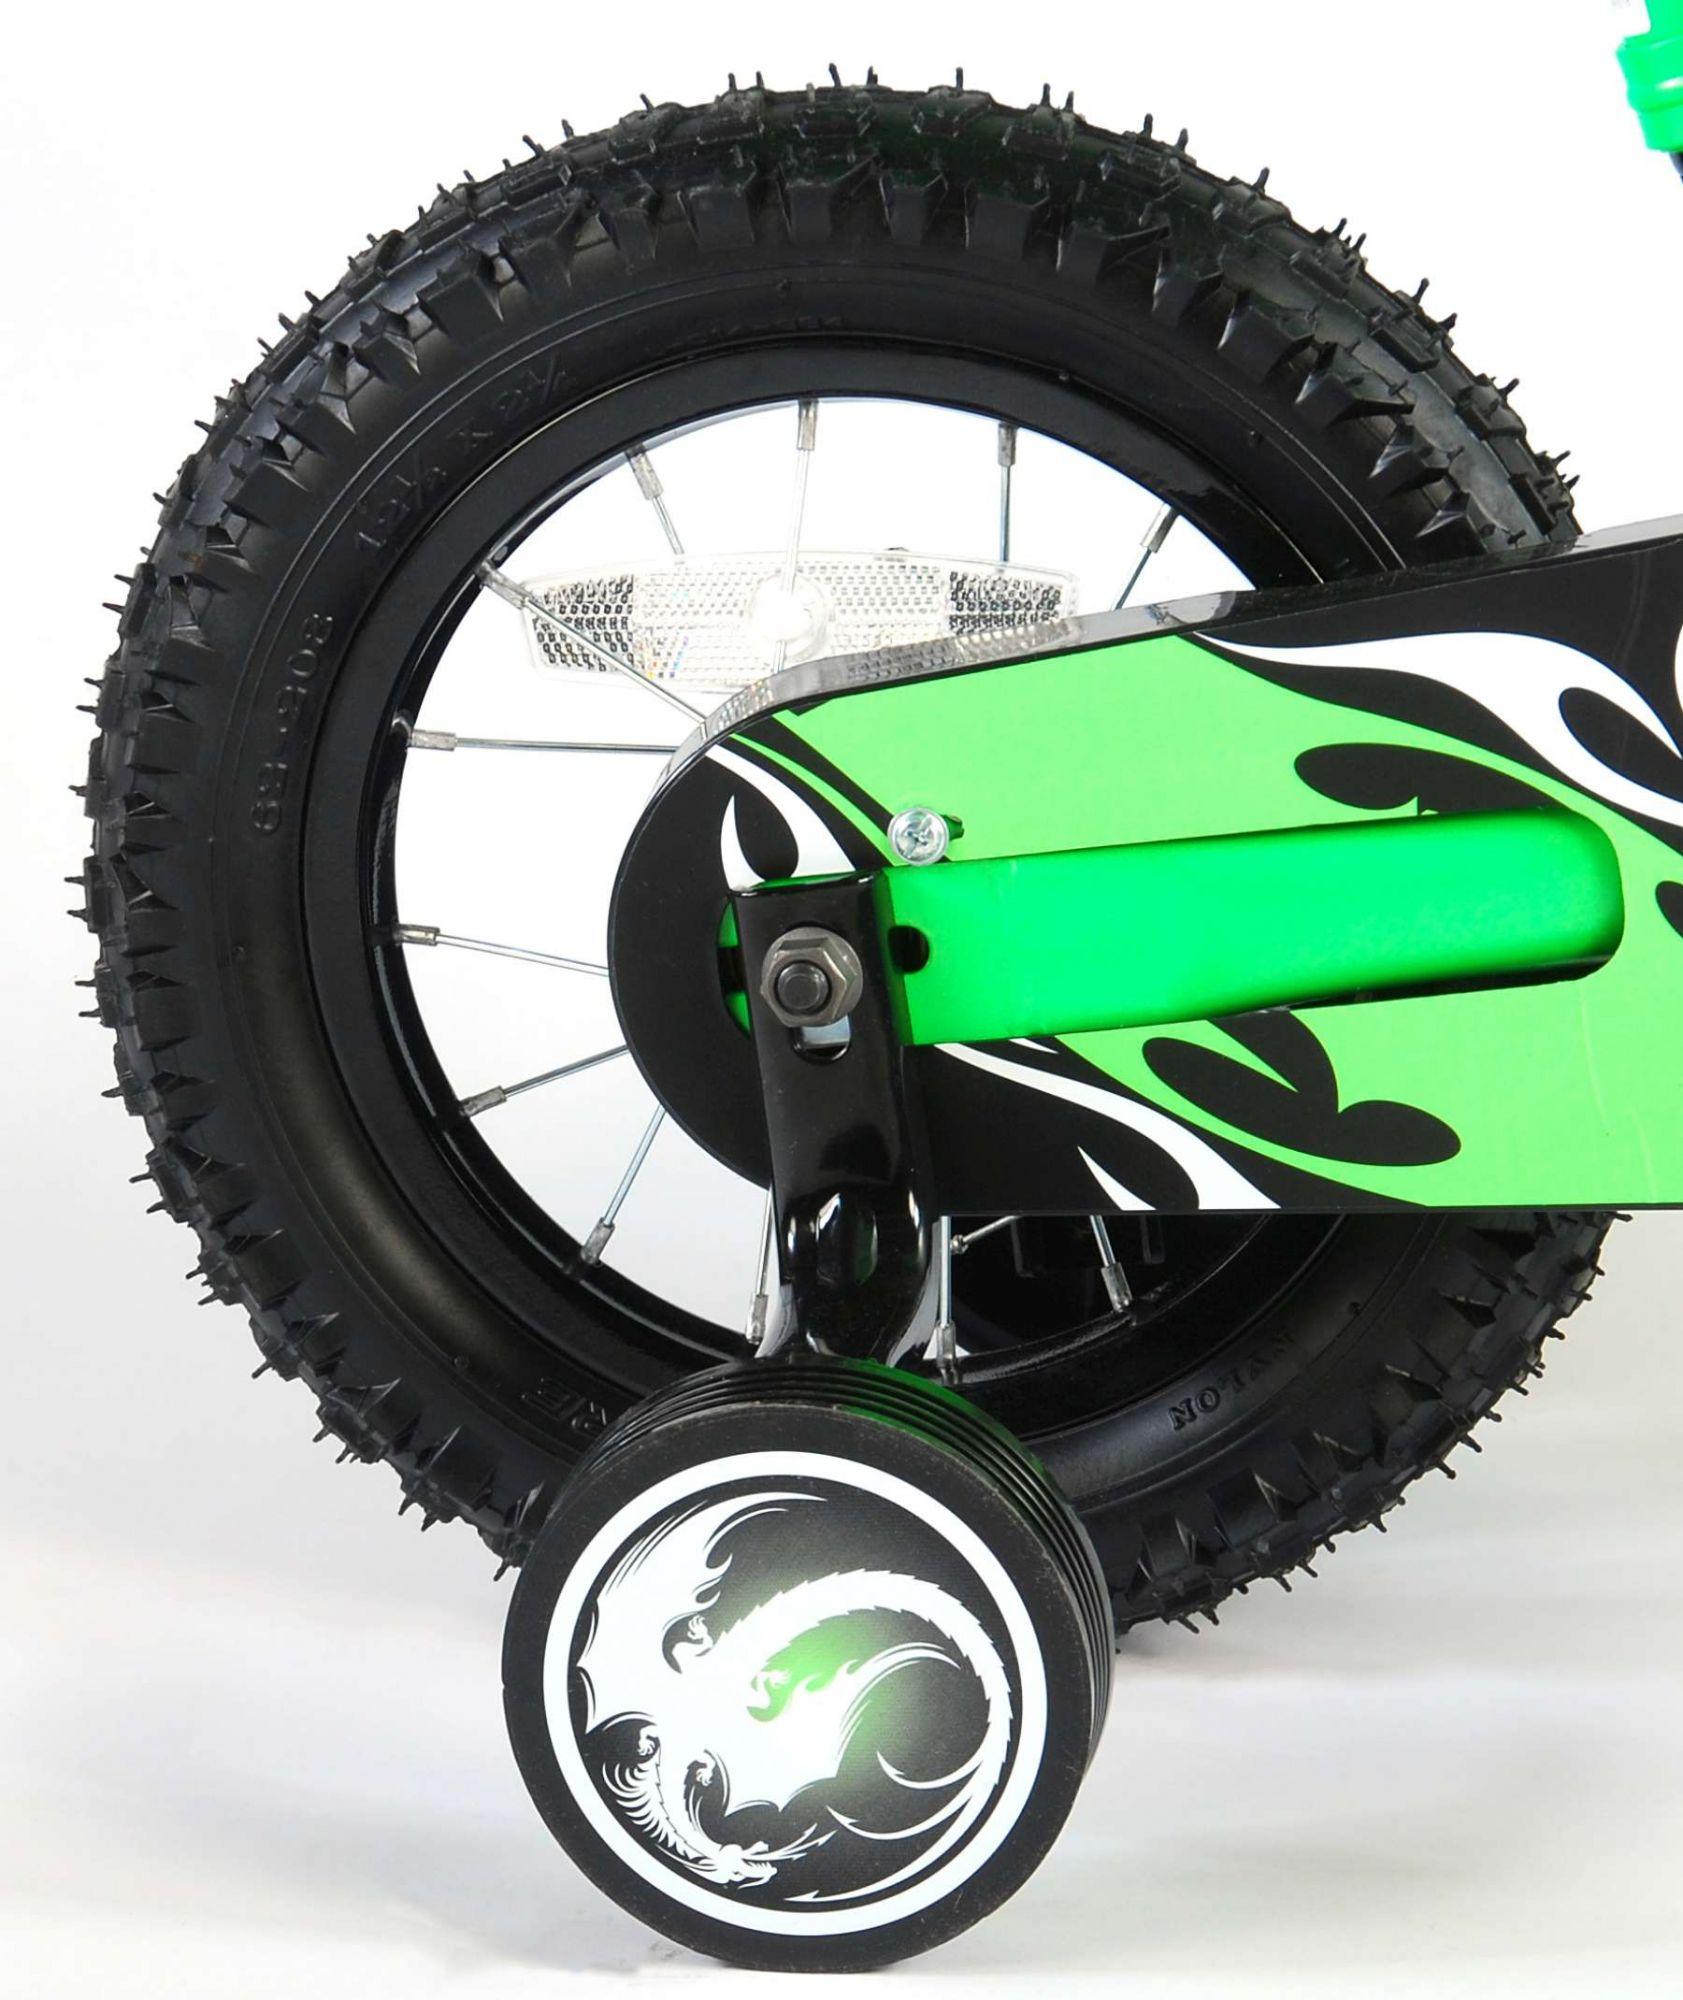 Bicicleta Motorbike de 12 pulgadas Verde - rueda trasera